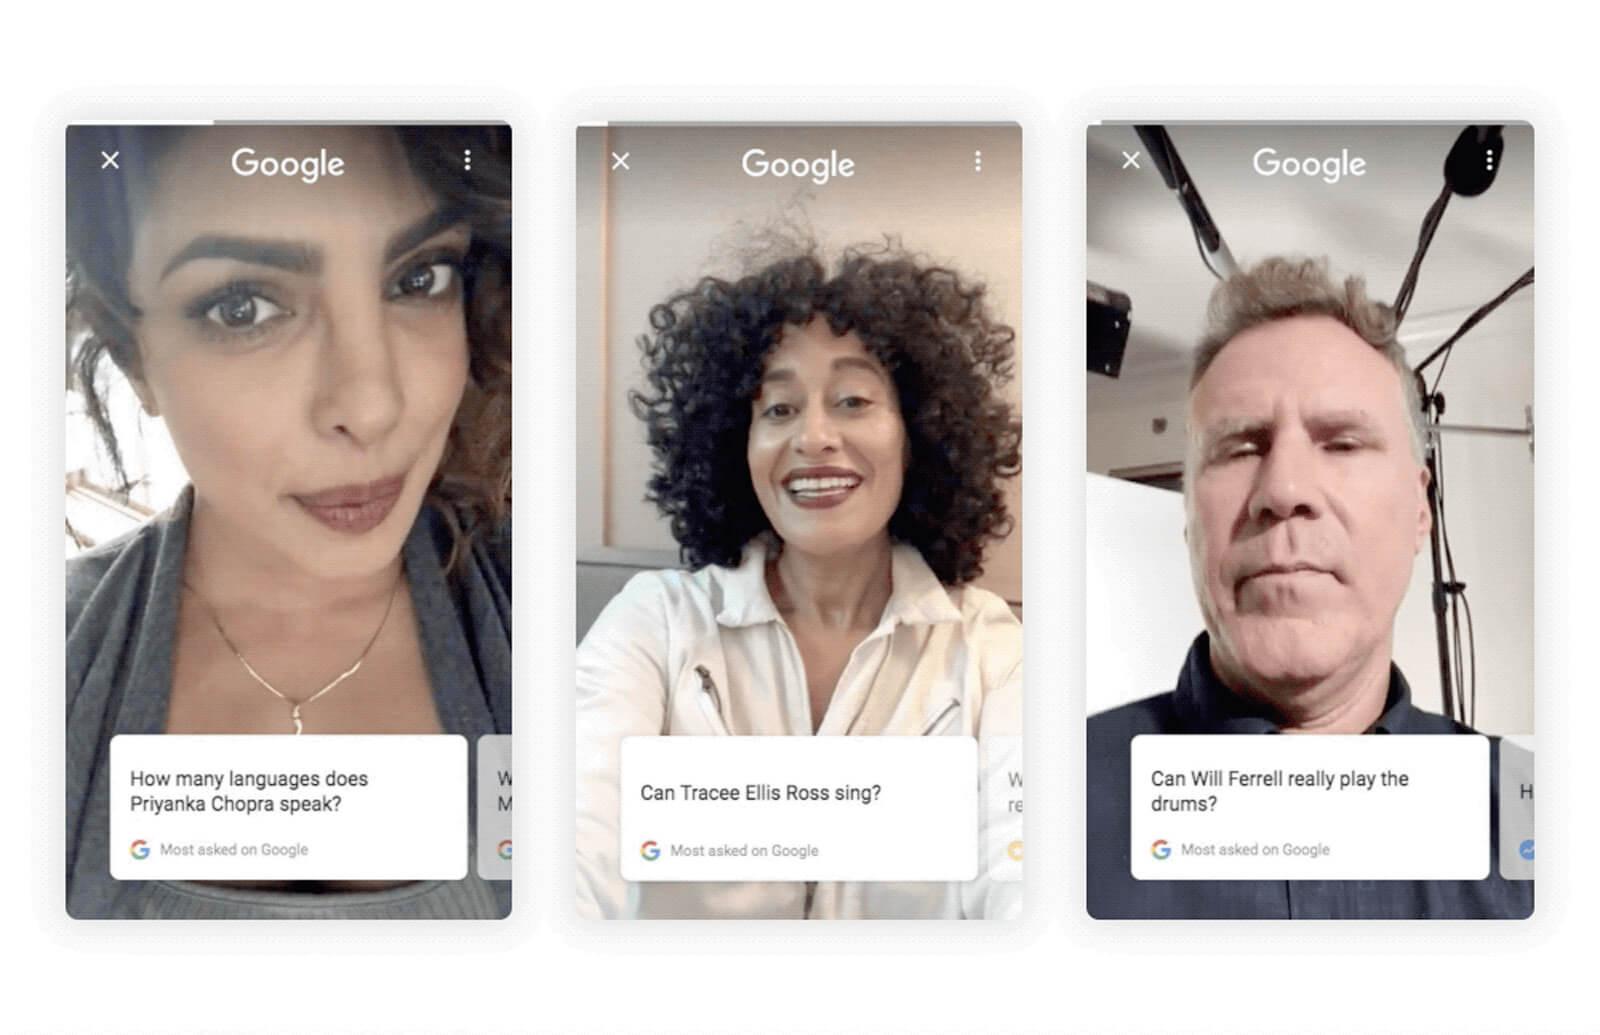 Google celebrity answers